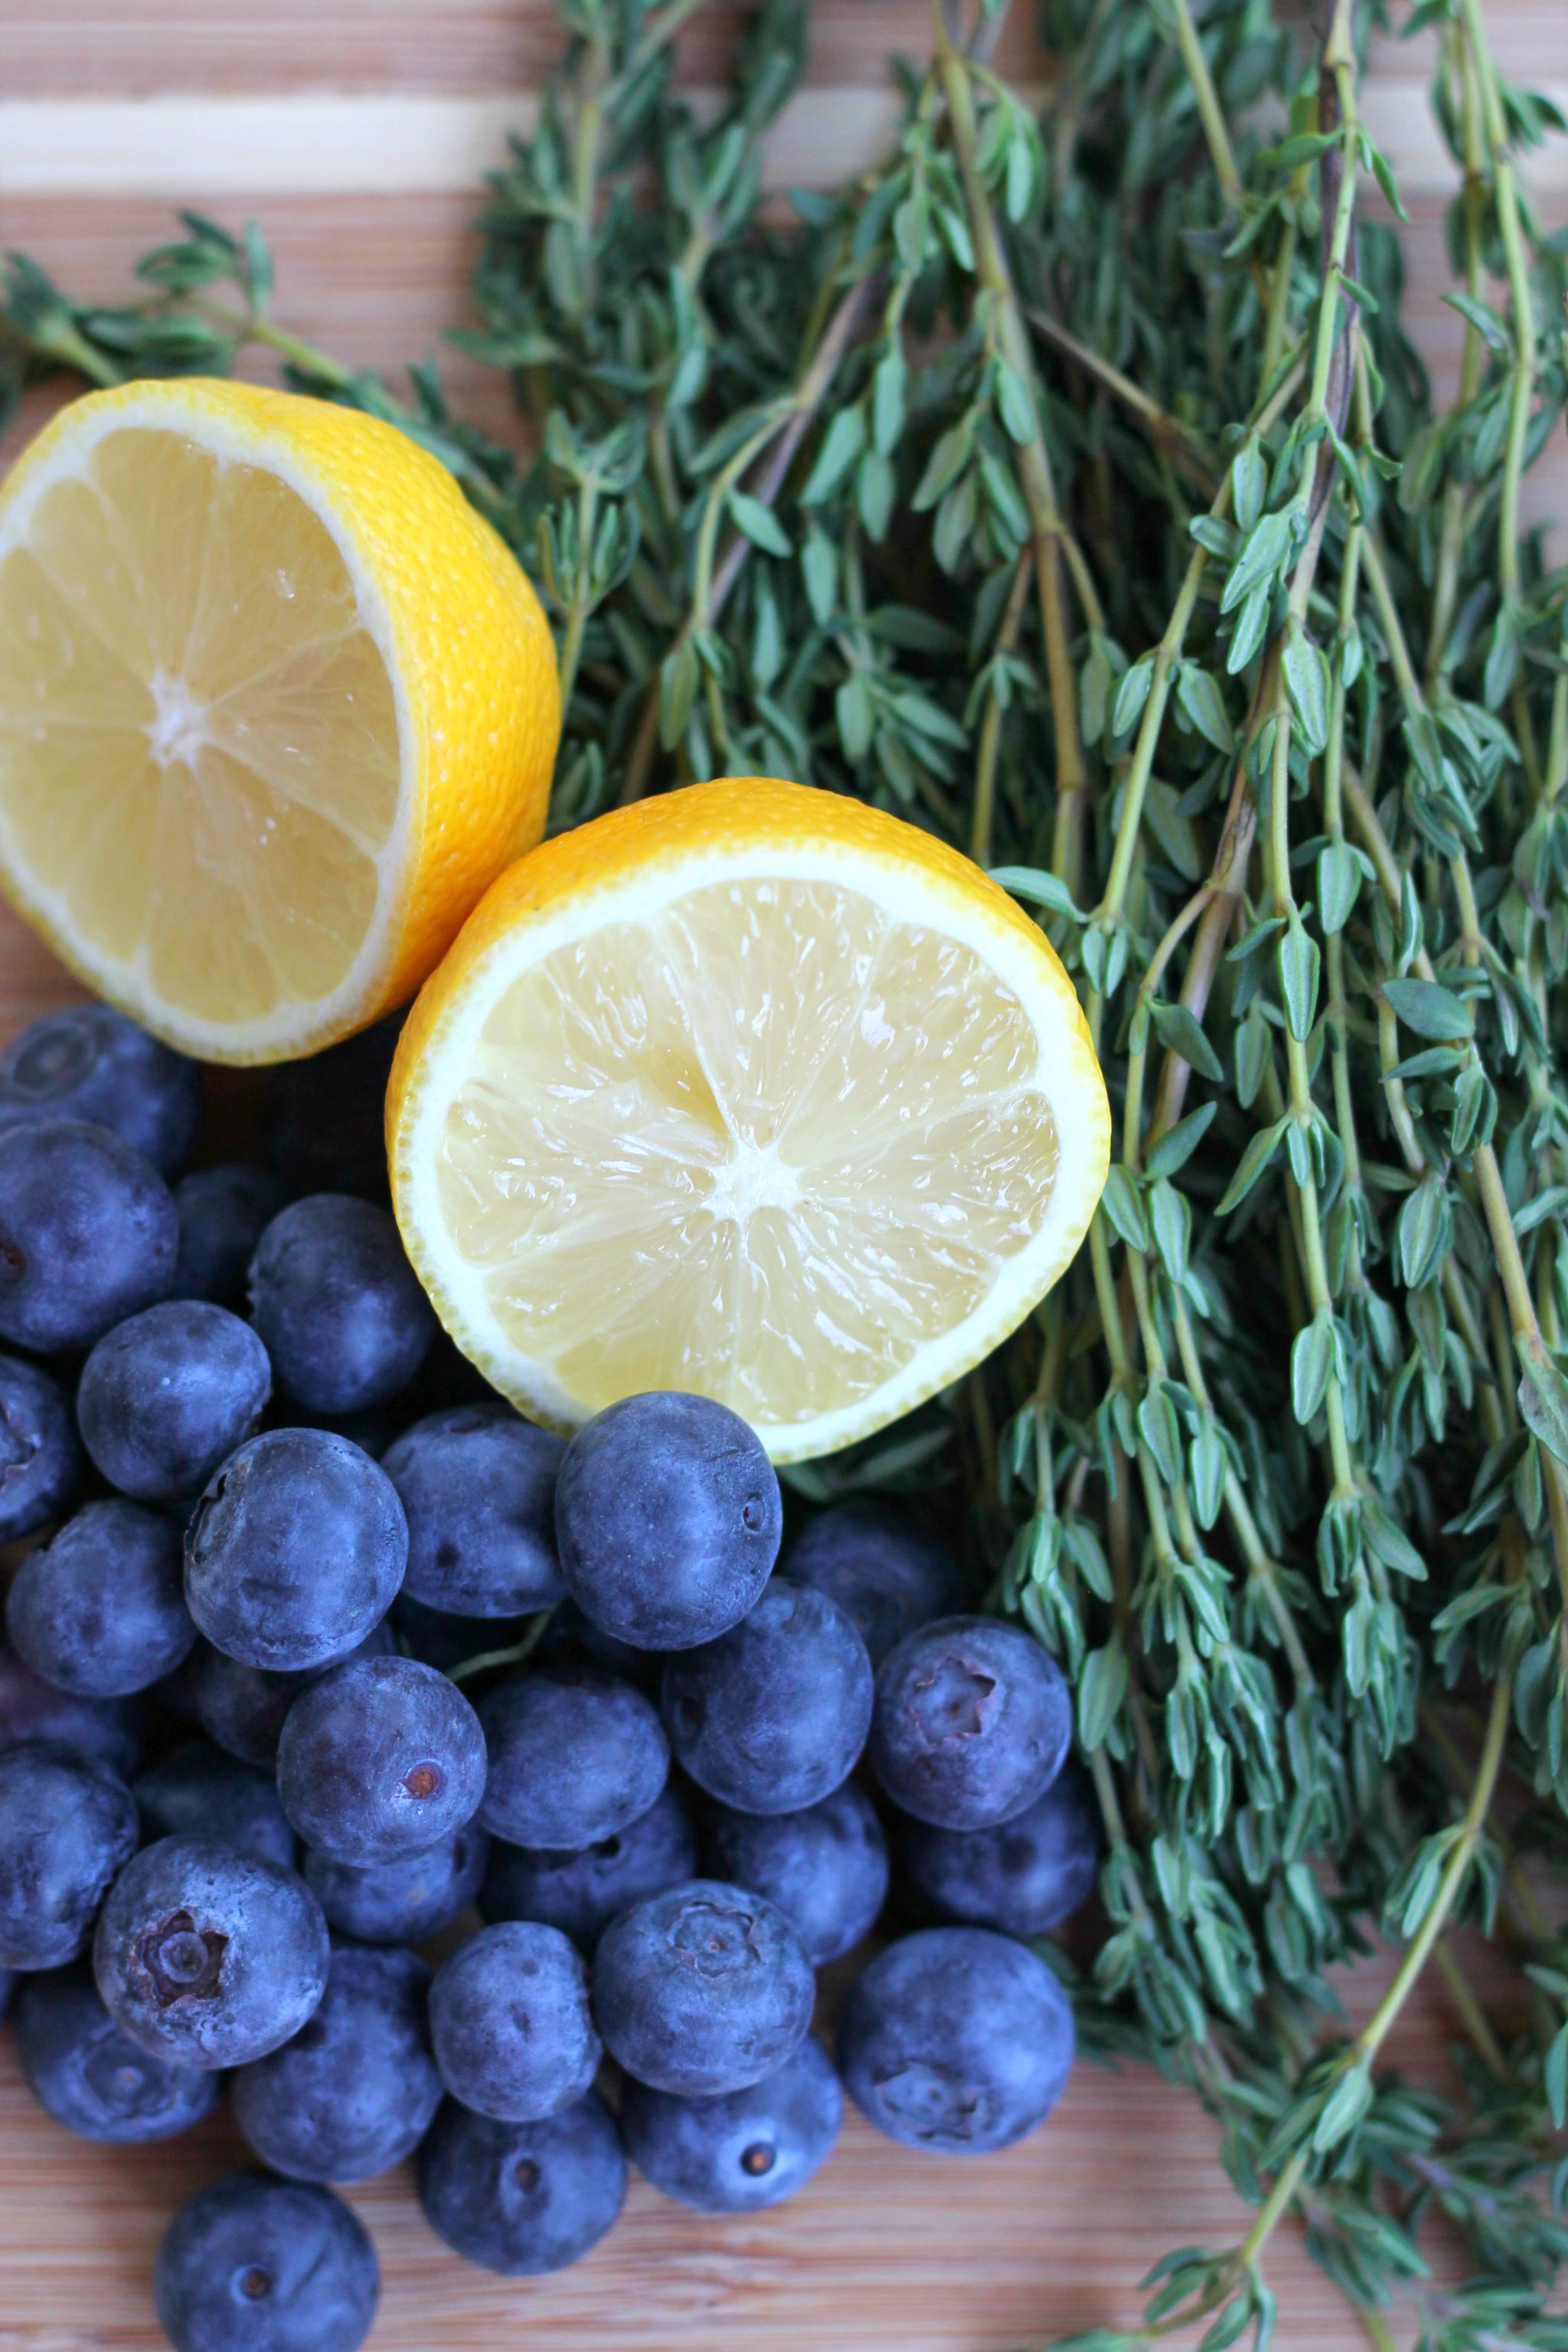 Blueberry Thyme Vodka Smash